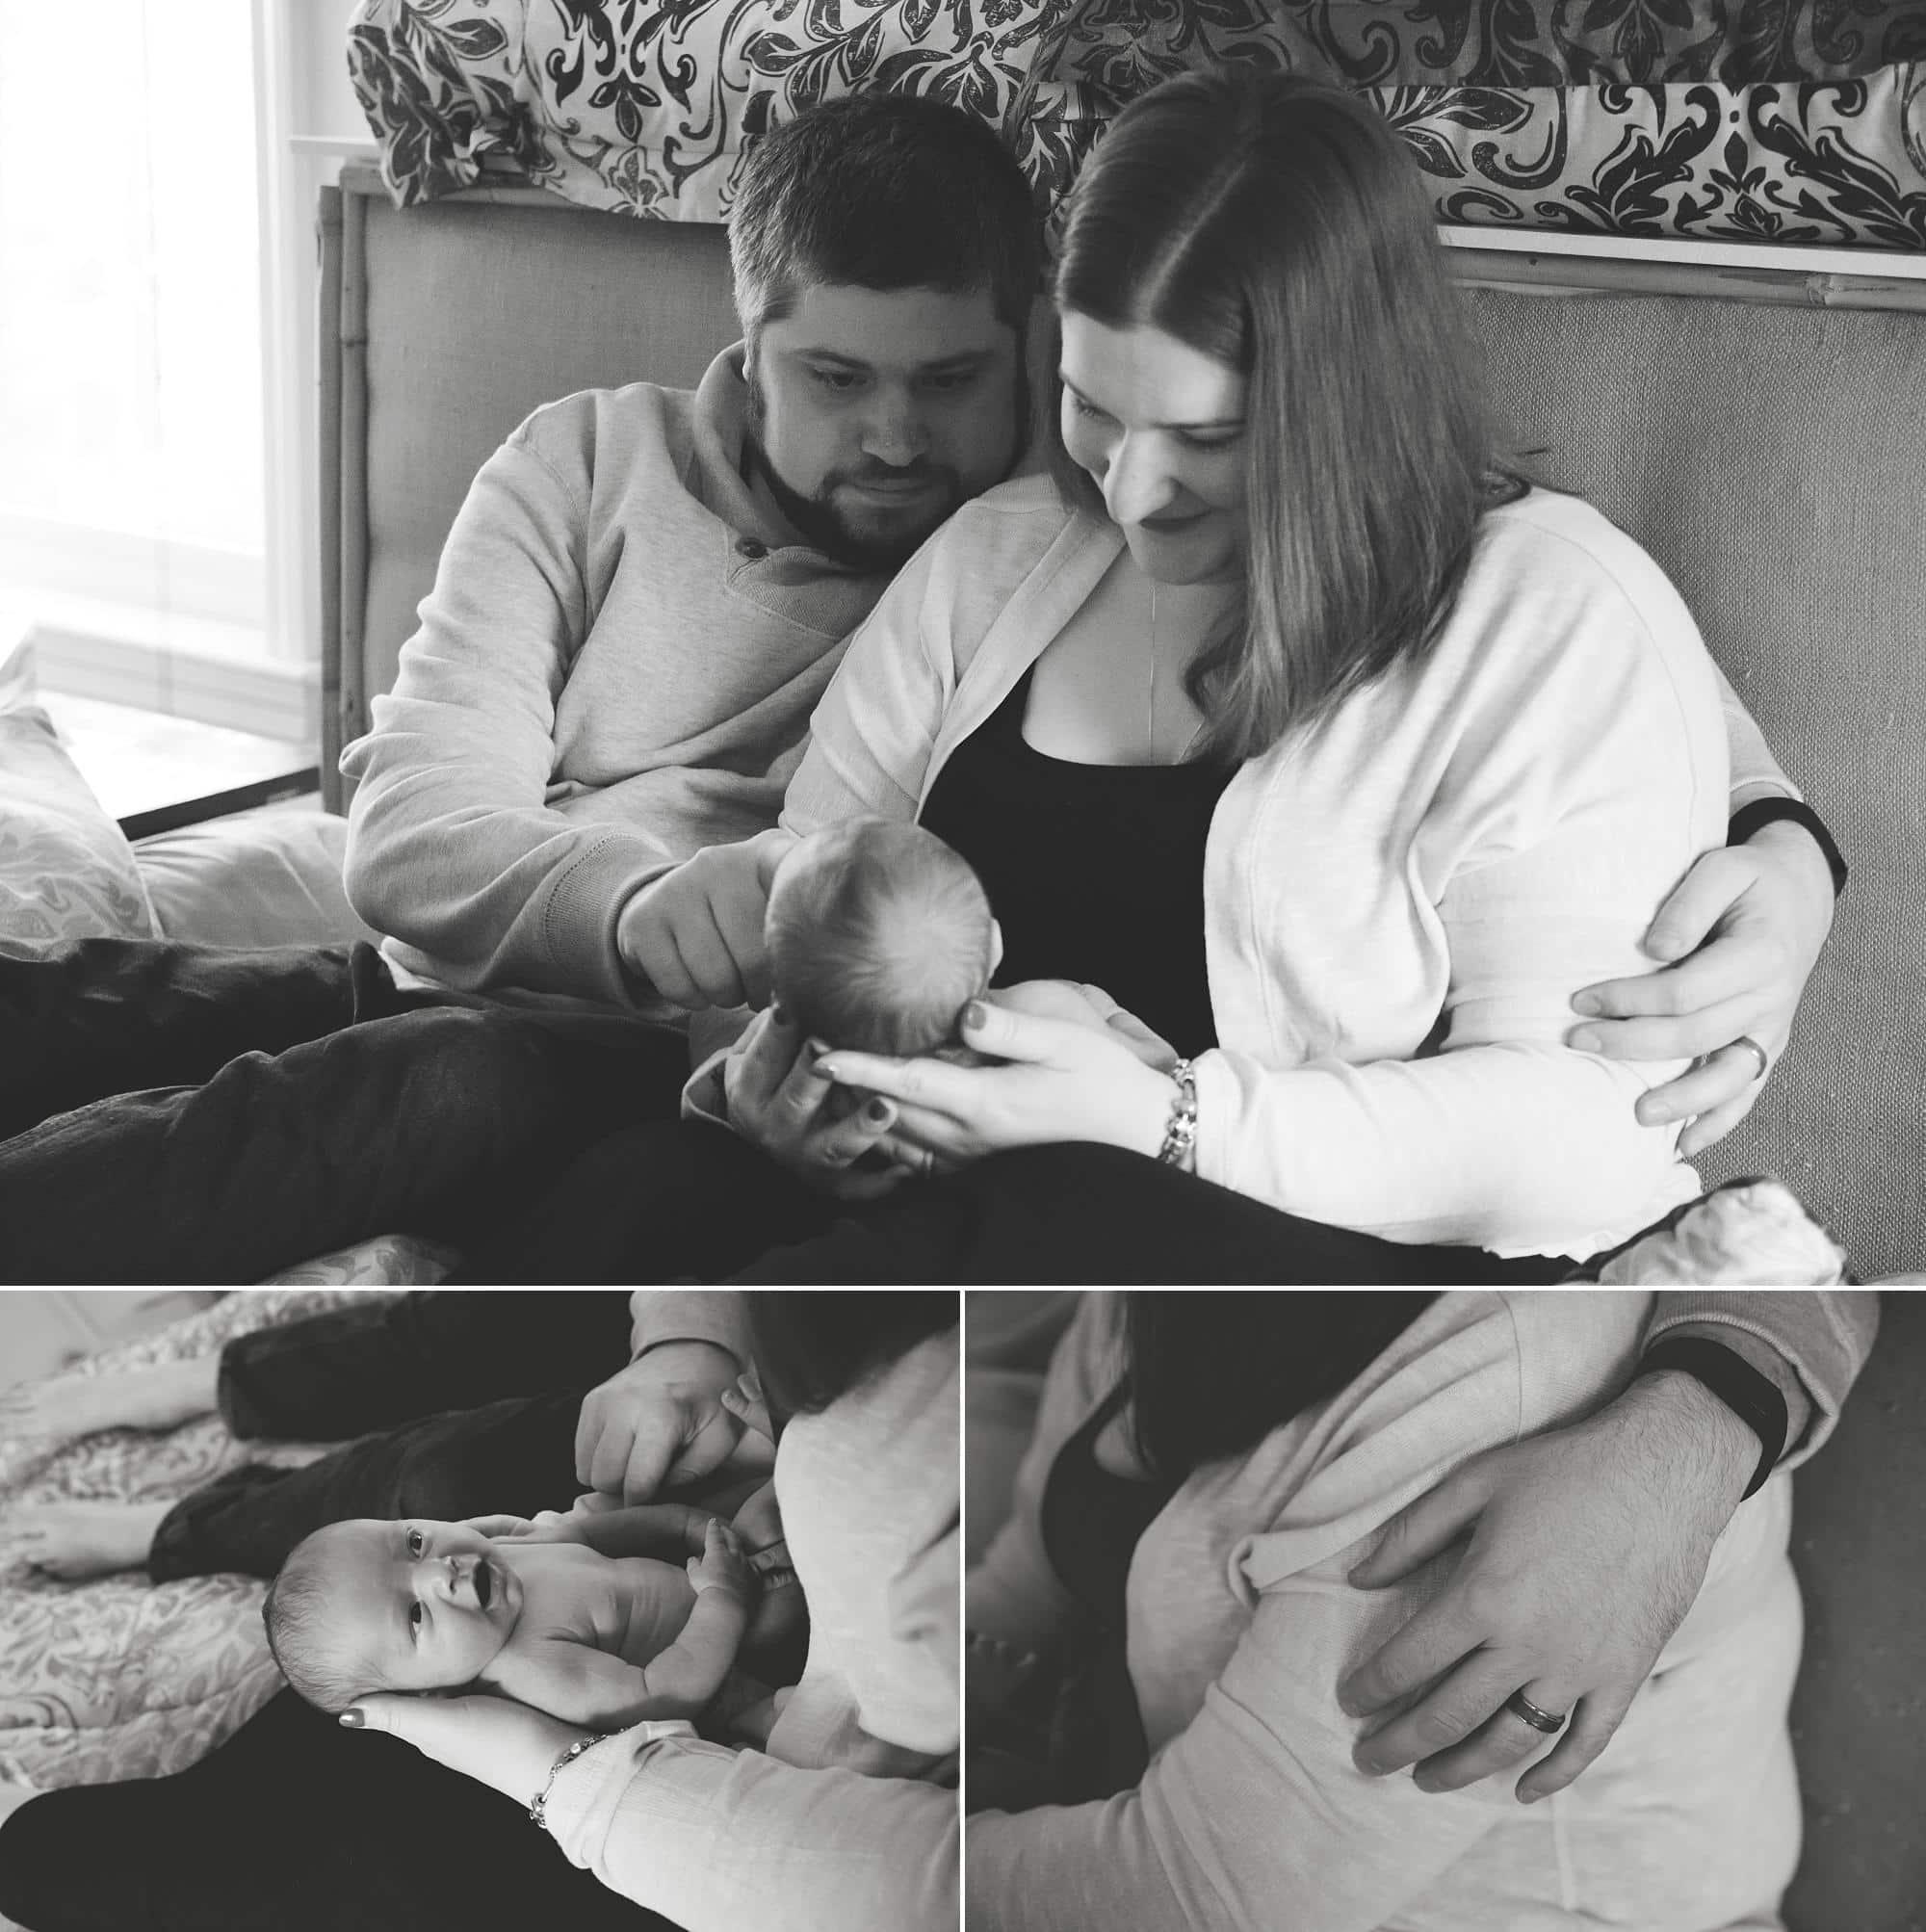 mom-dad-cuddling-bed-looking-newborn-girl-lifestyle